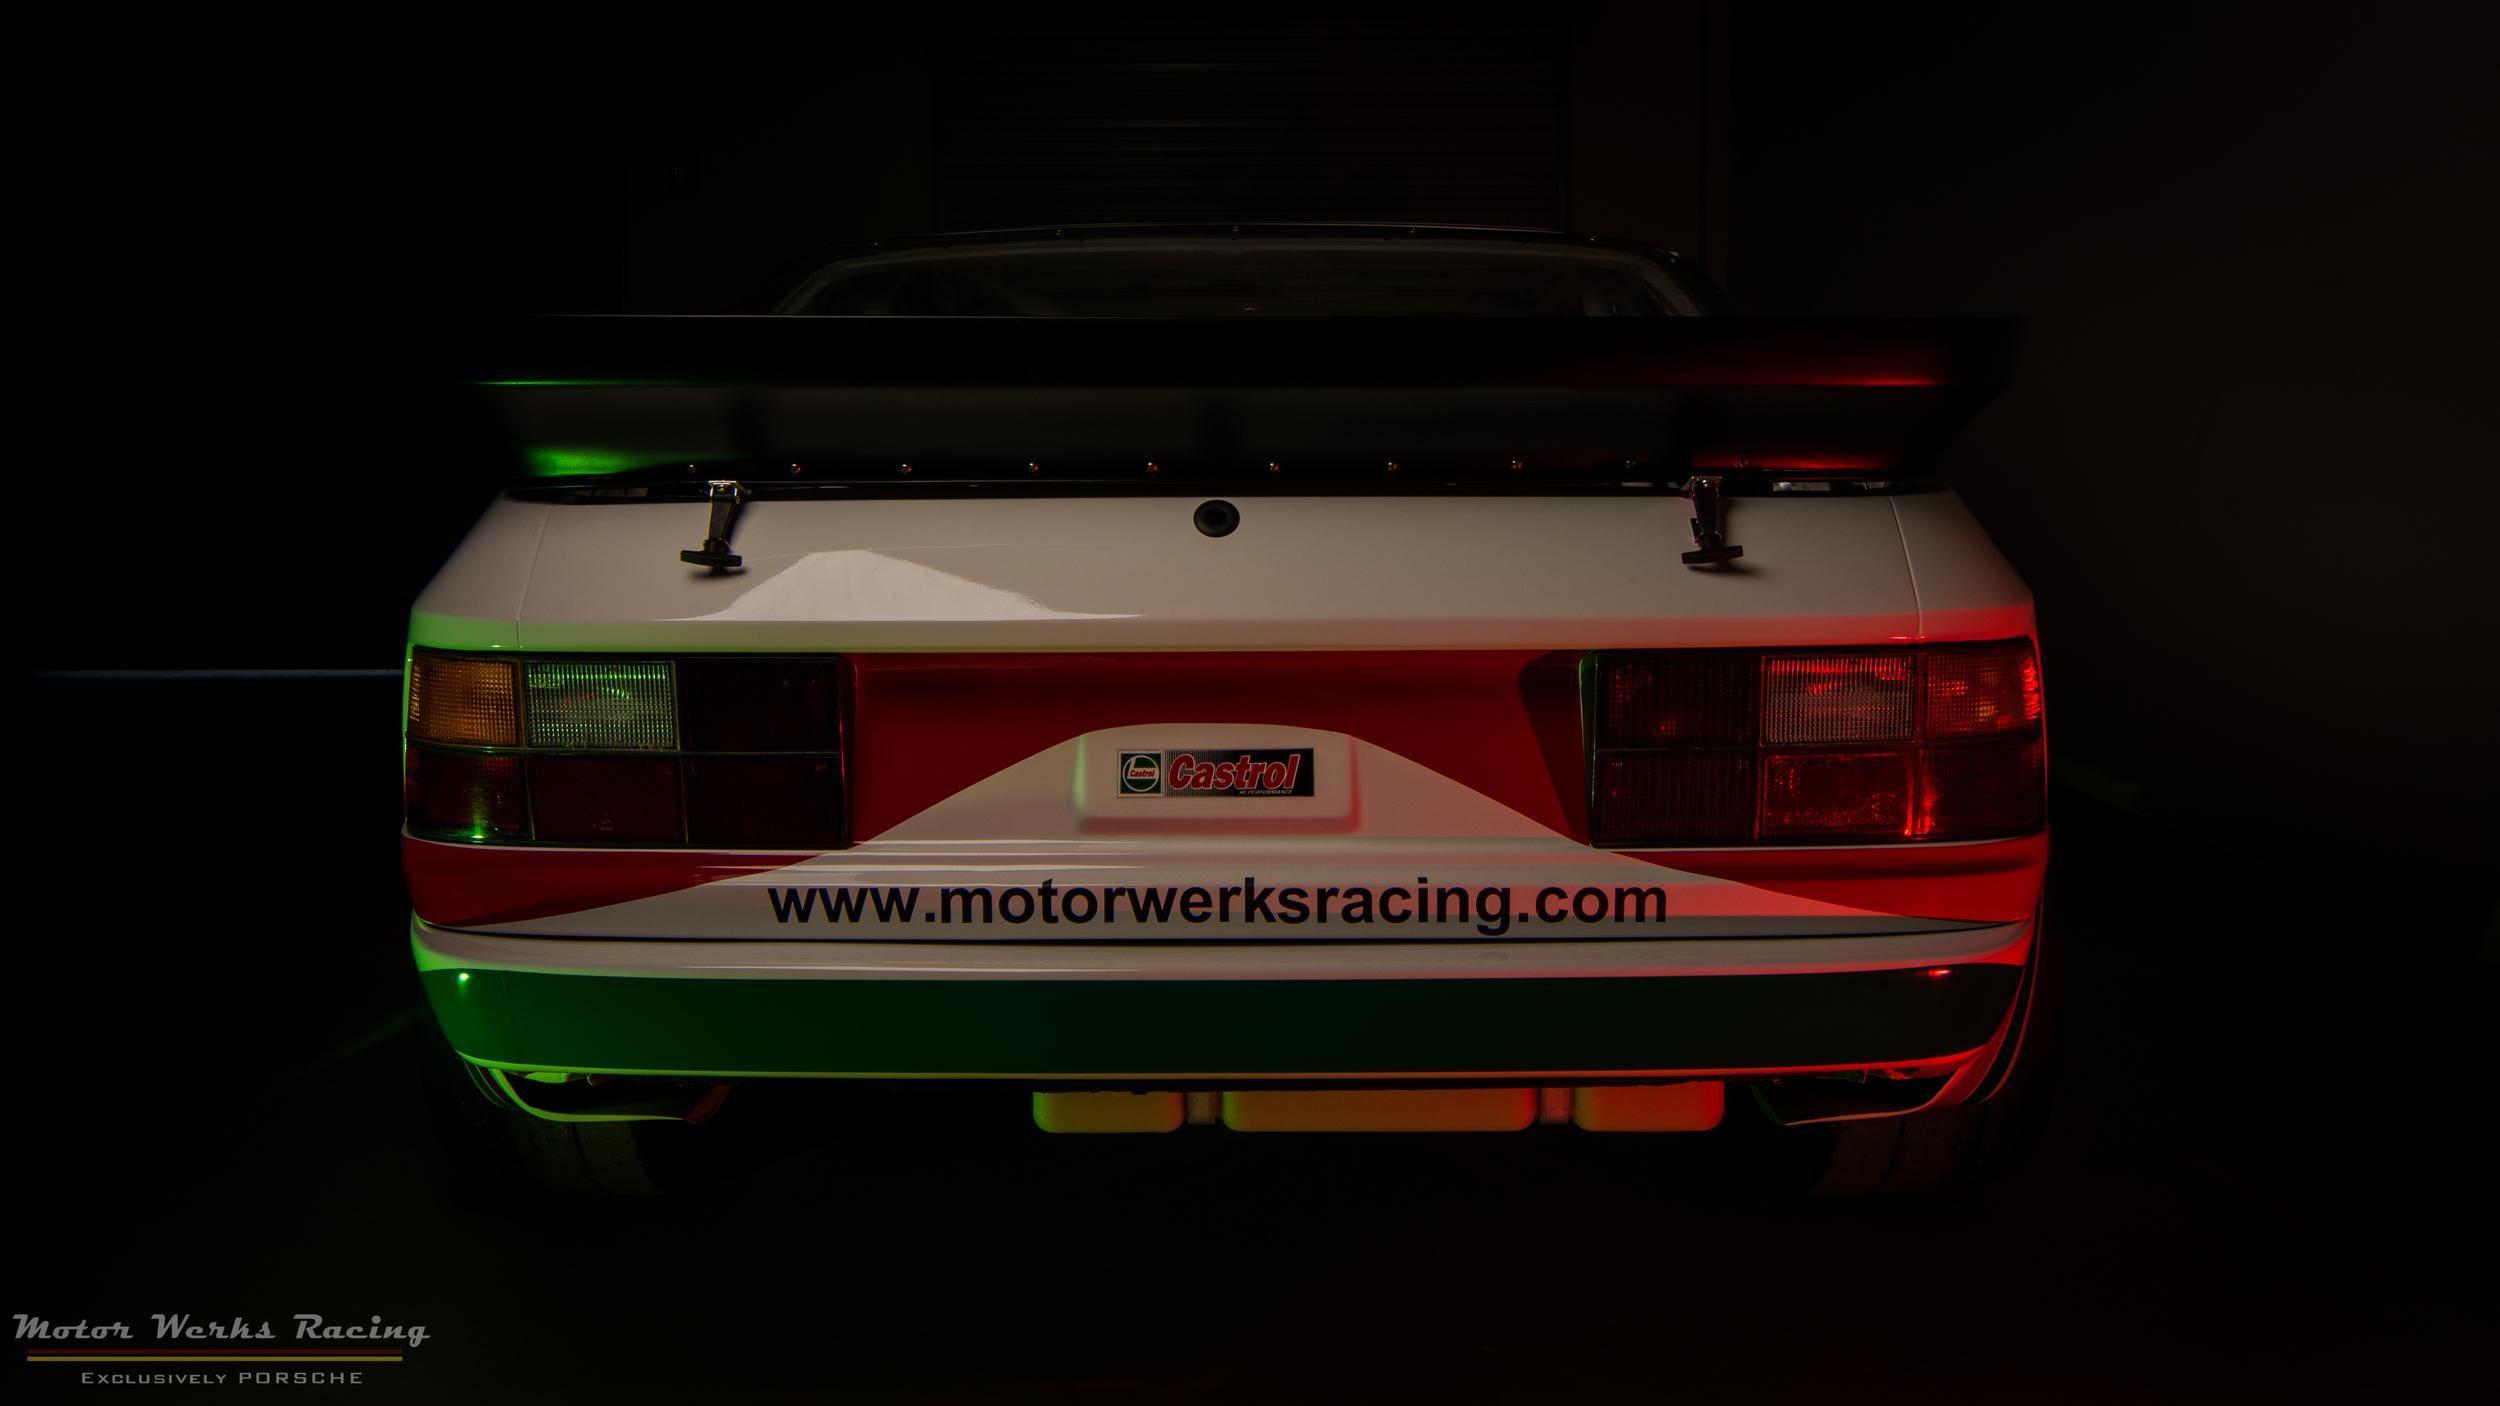 Motor Werks Racing Purpose Built Track Car - Porsche 944 1.8T